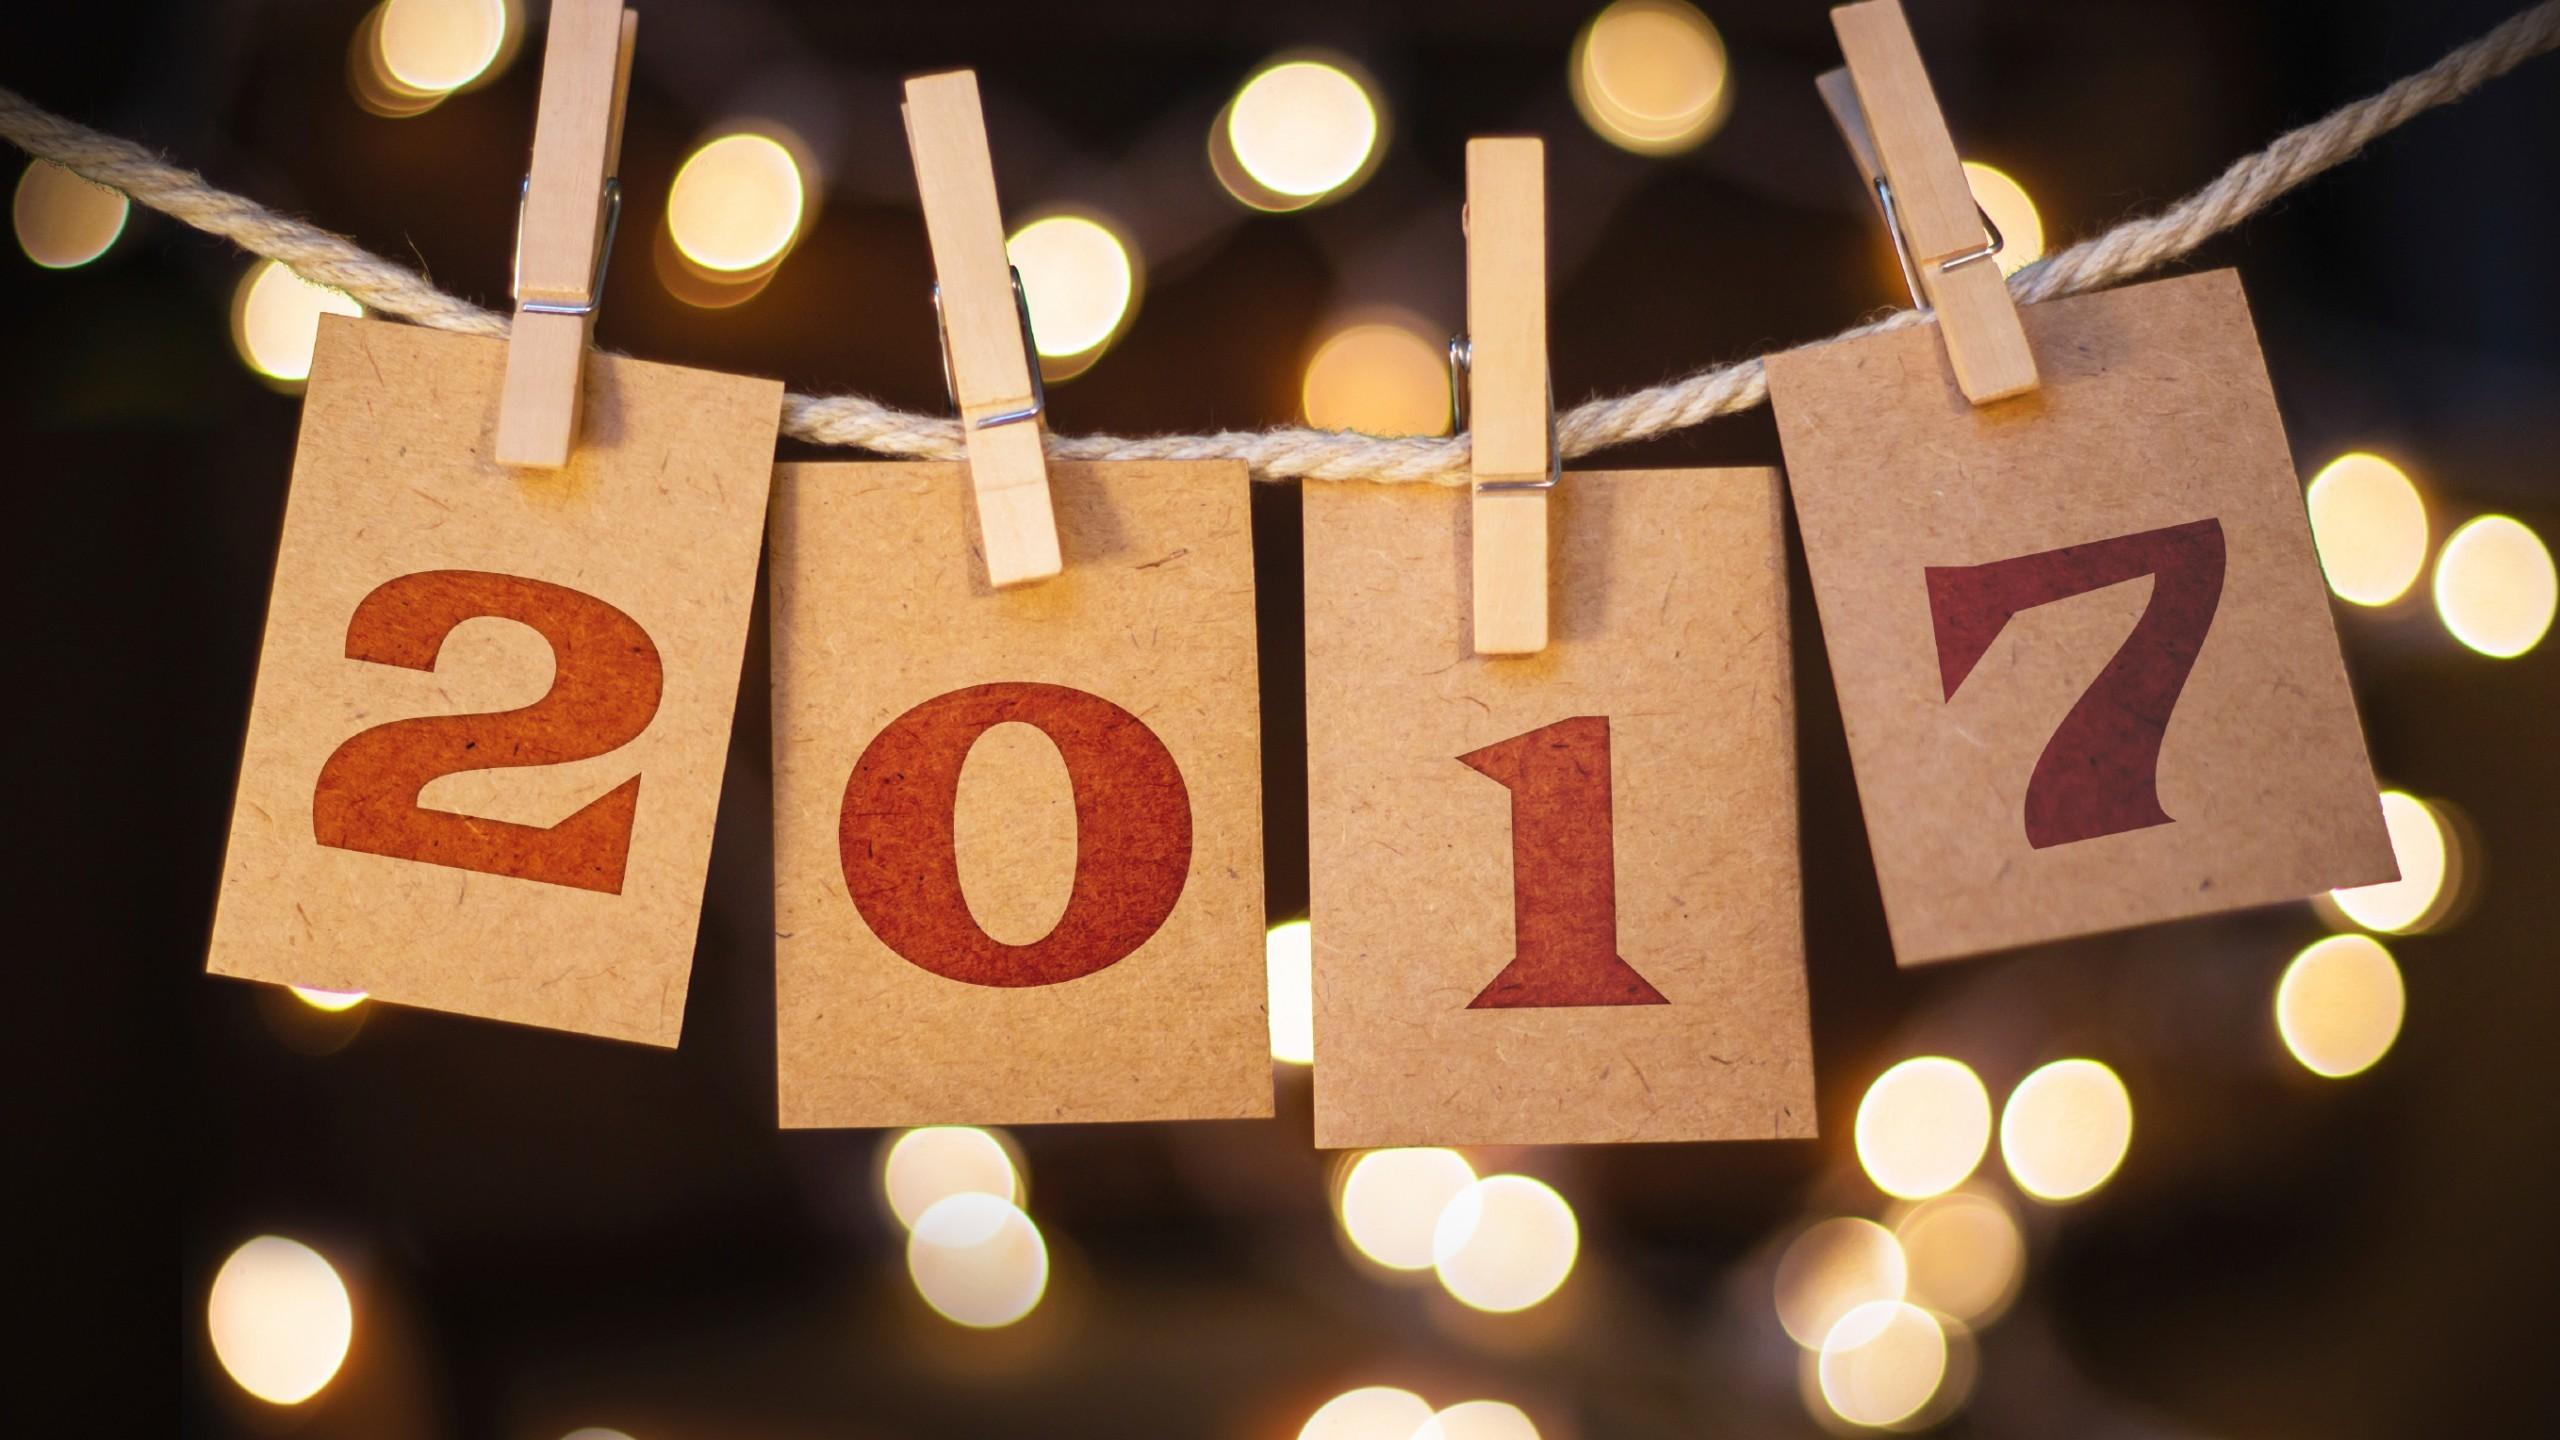 Celebrations / New Year / 2017 Wallpaper